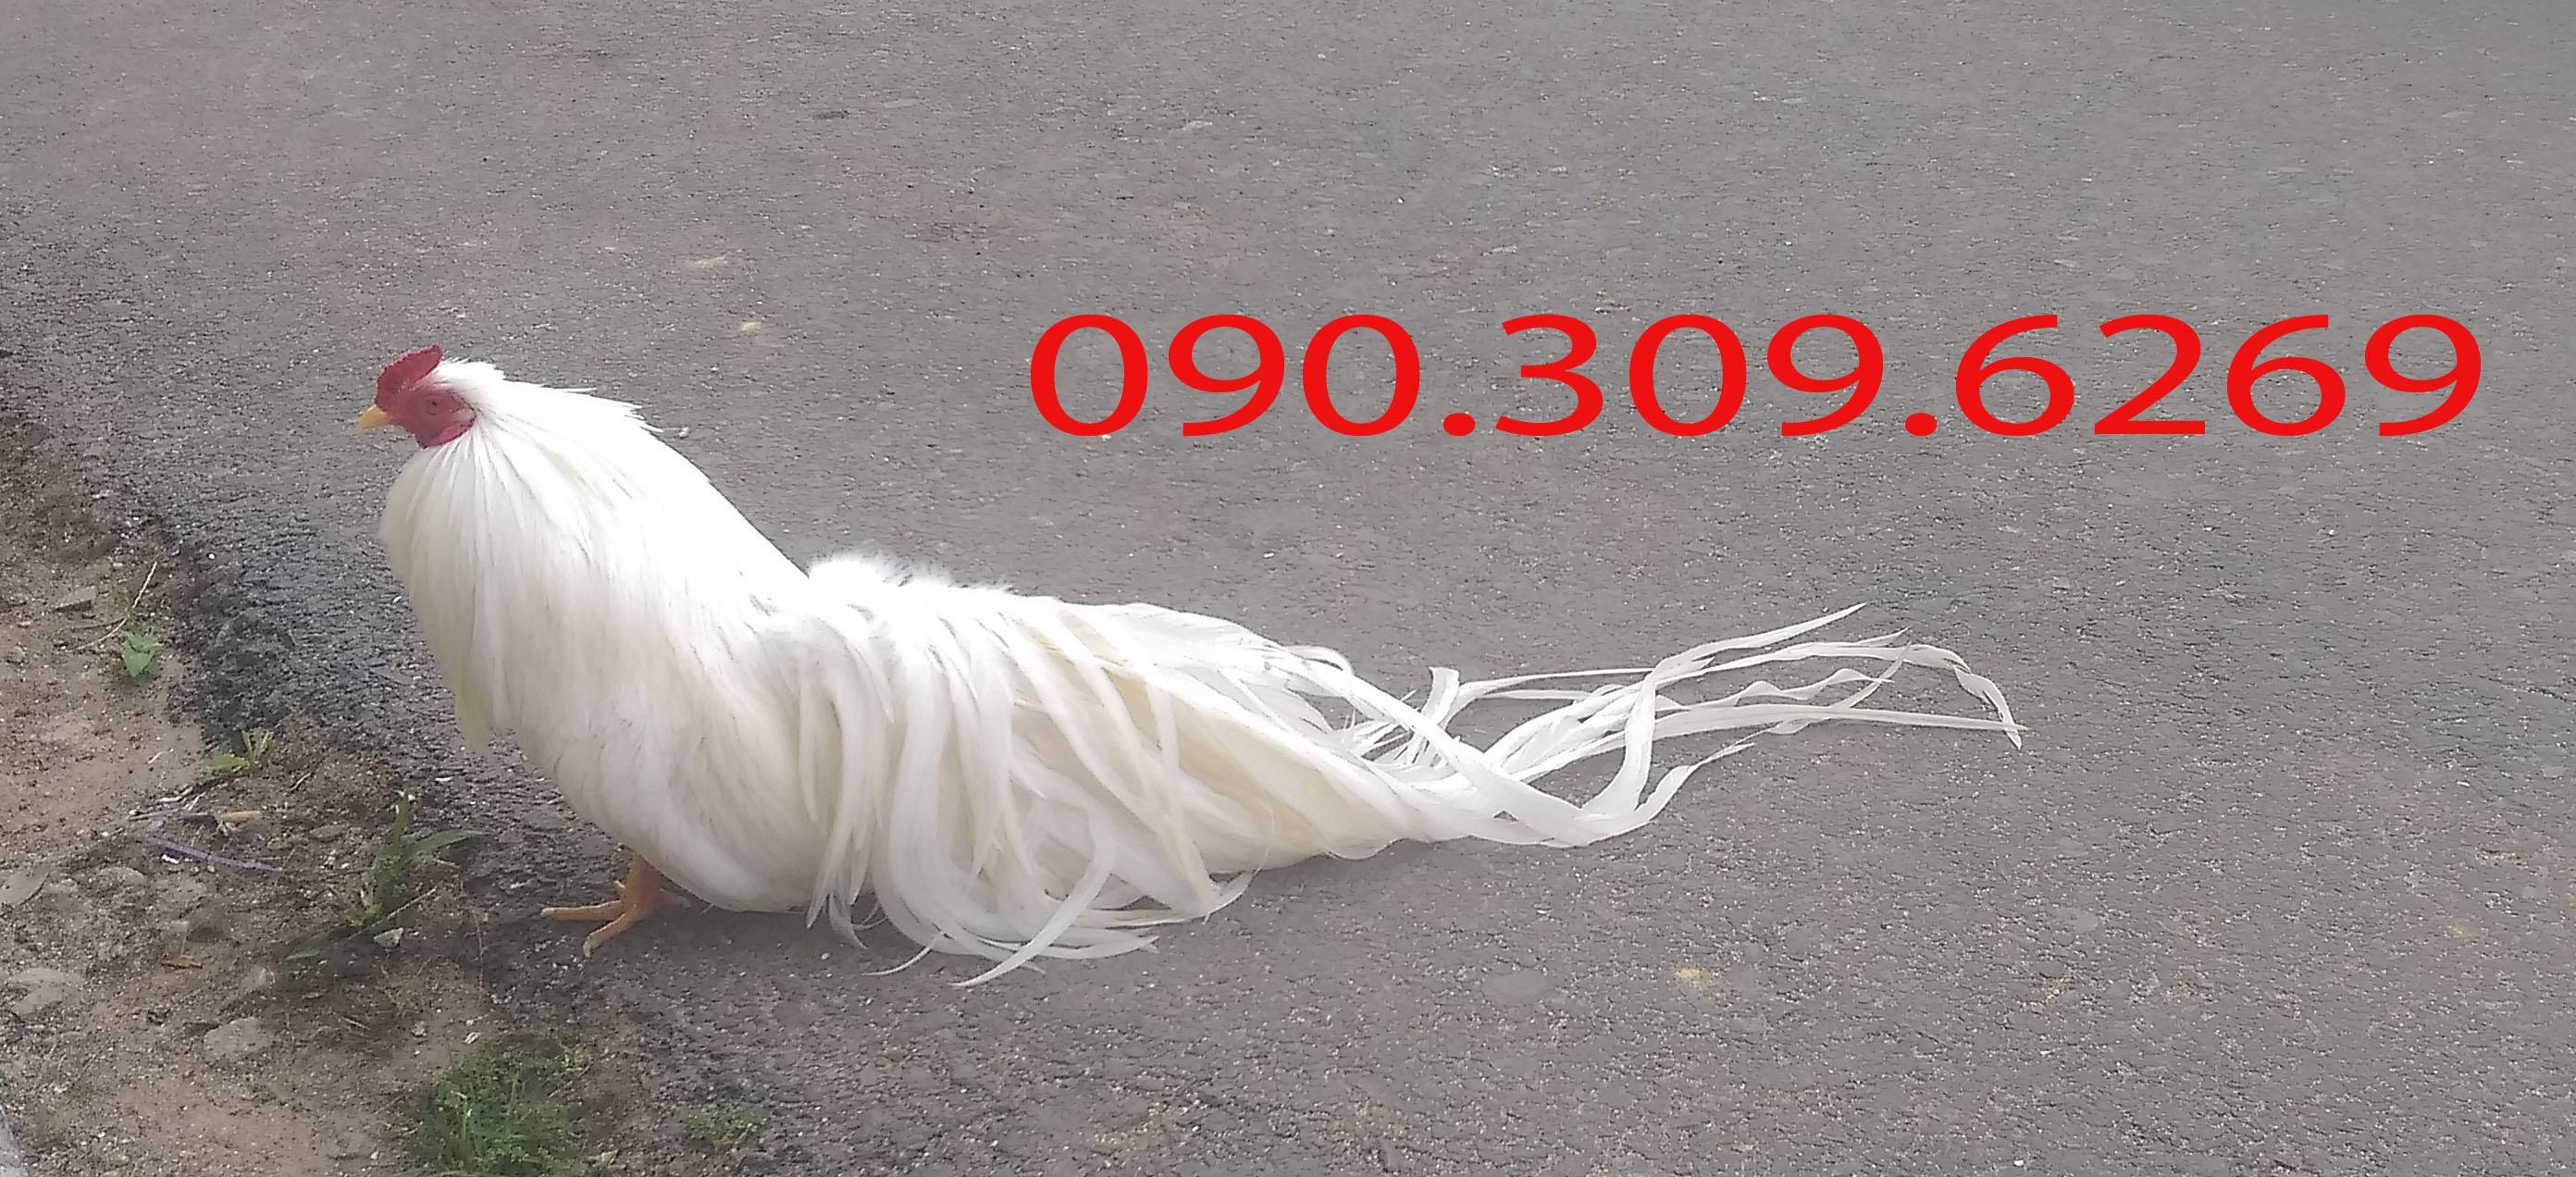 38937920894_1c506b01fc_o.jpg